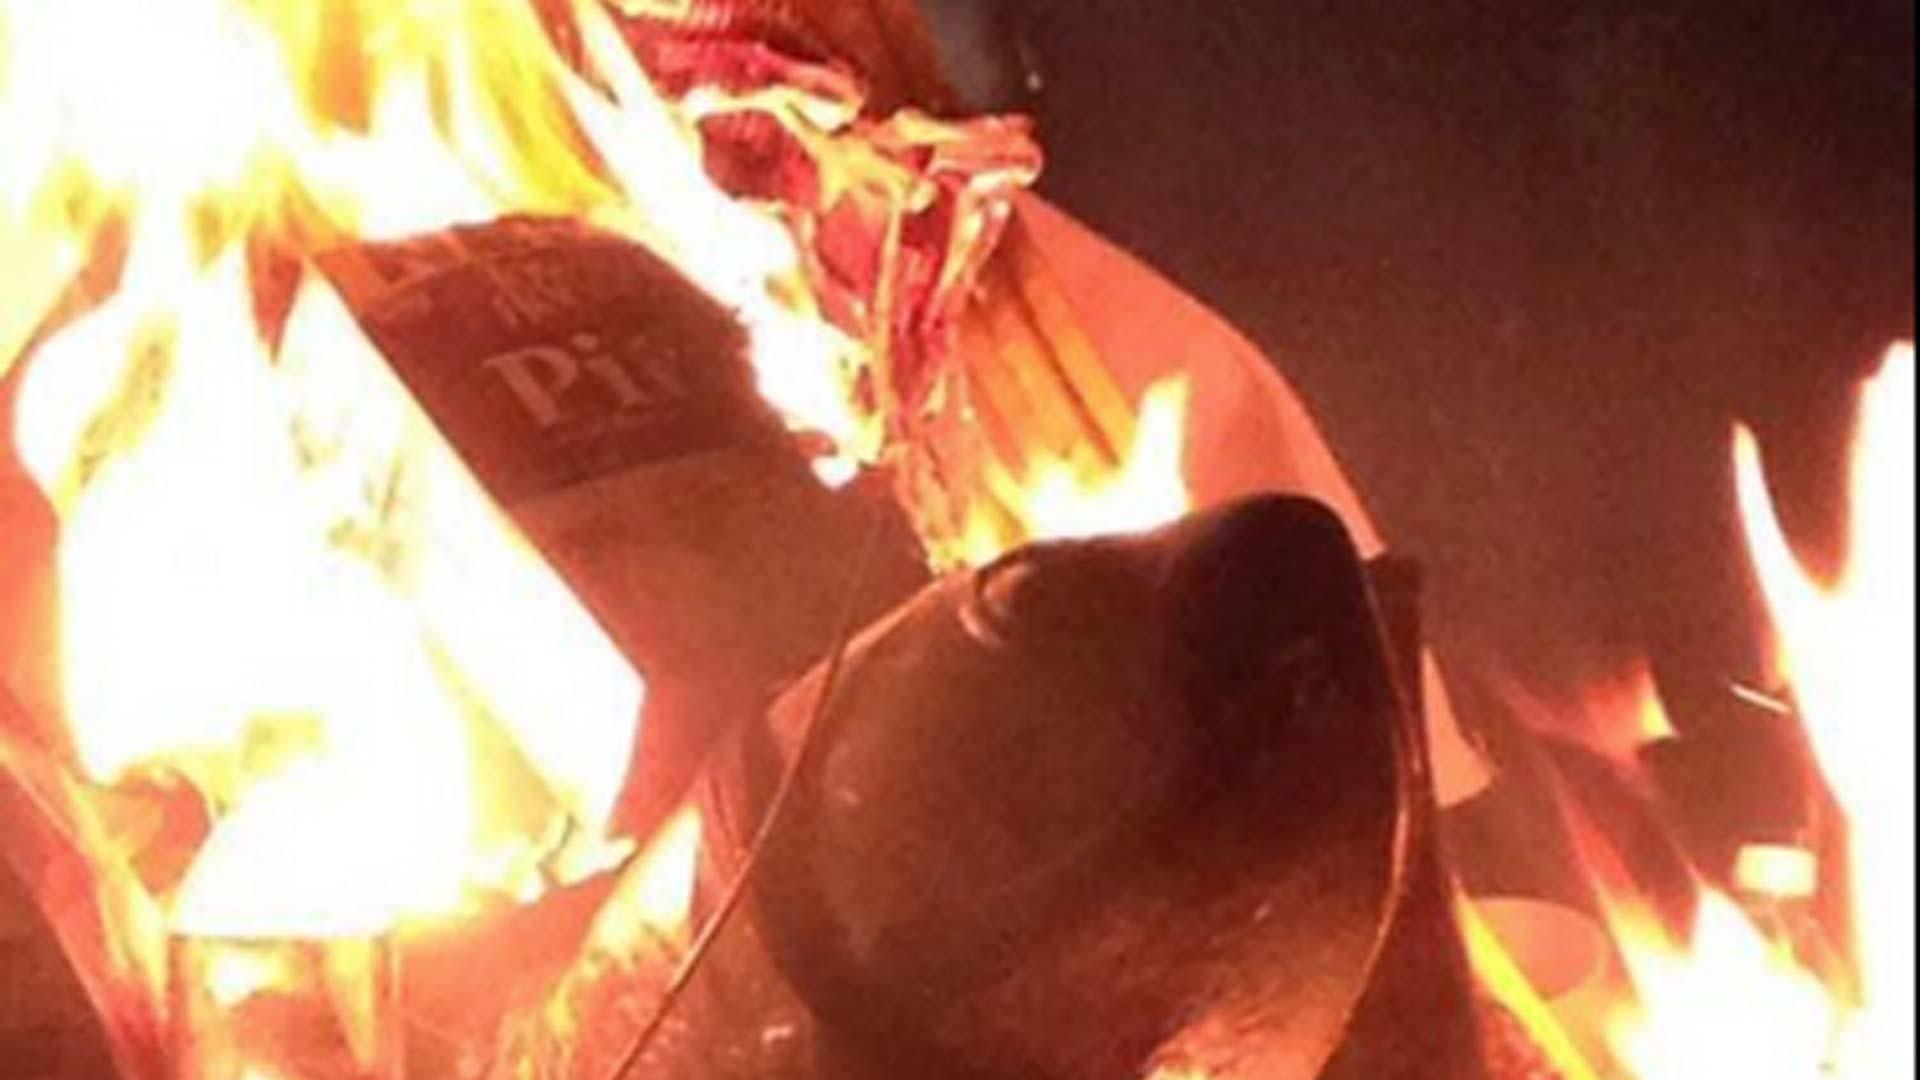 Testudo-Fire-Maryland-121813-Twitter-FTR